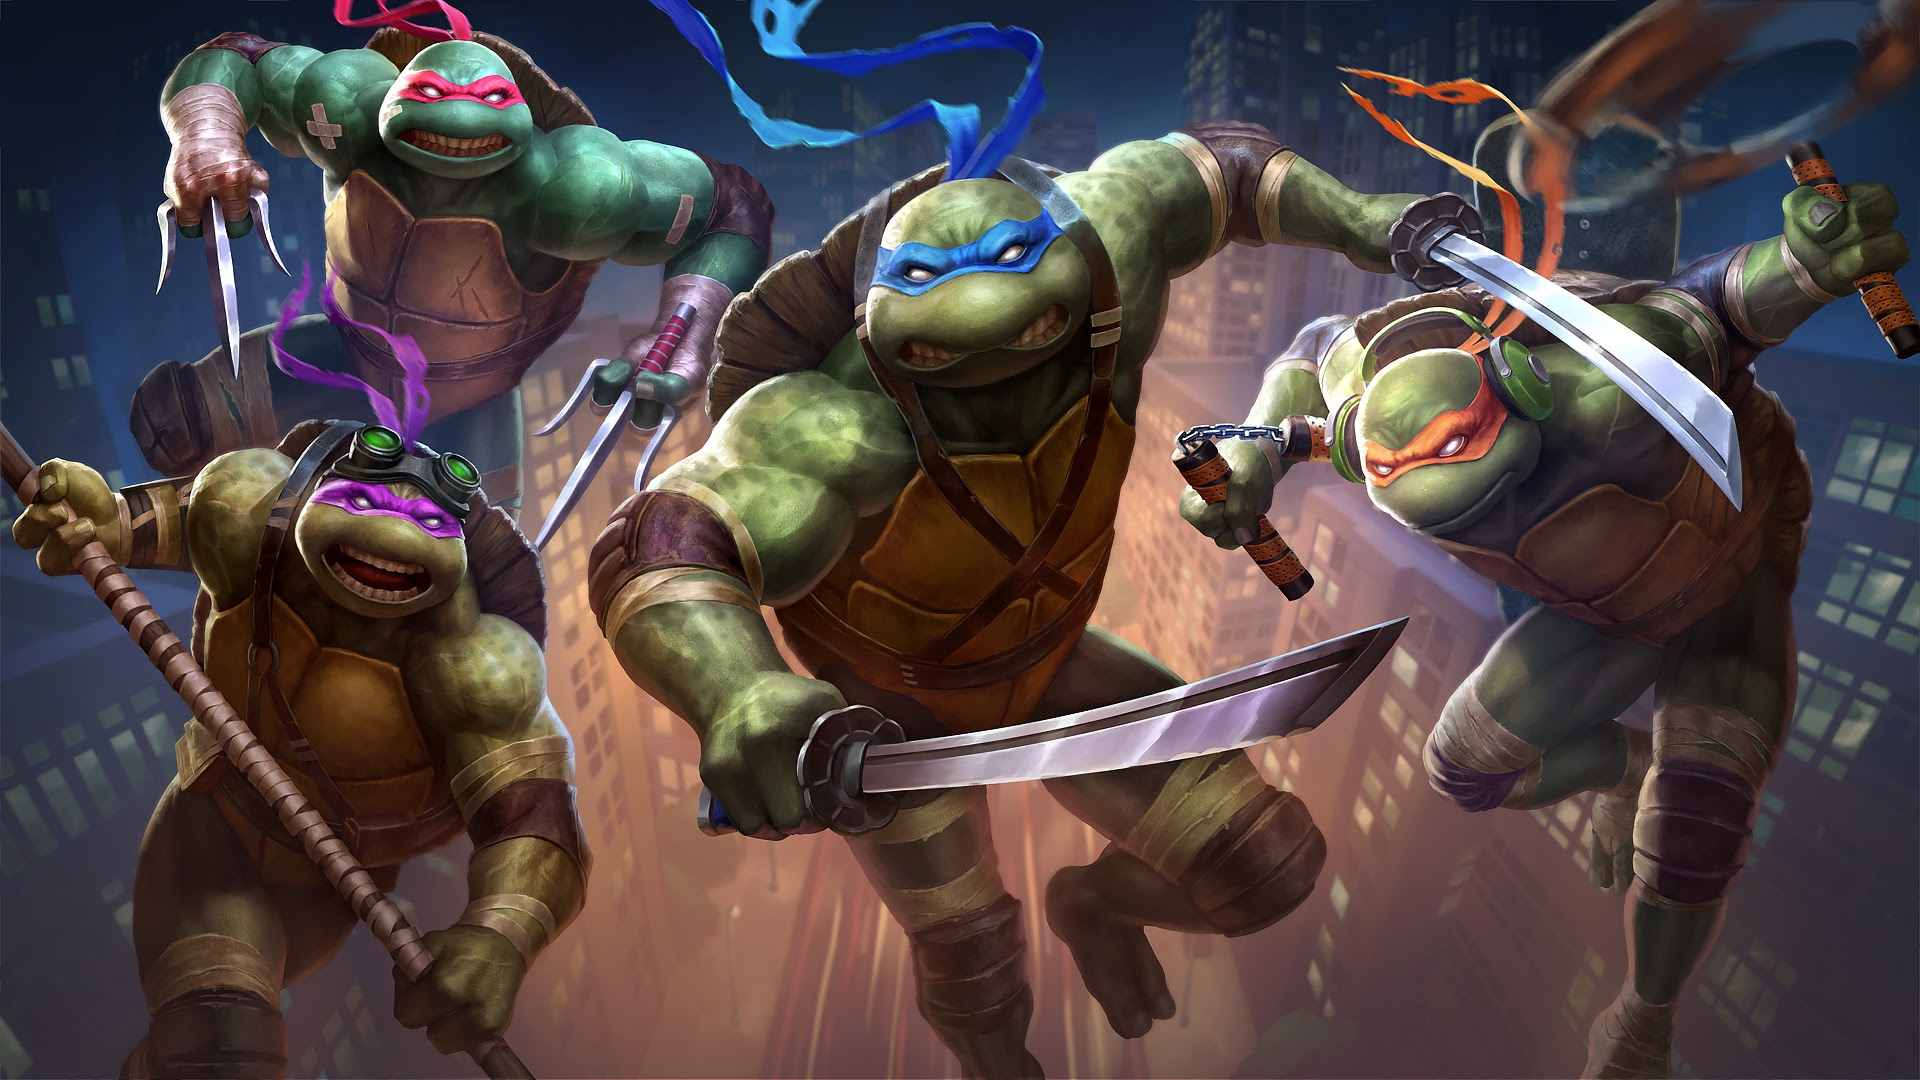 Smite Adds Teenage Mutant Ninja Turtles As Playable Characters Nintendo Life